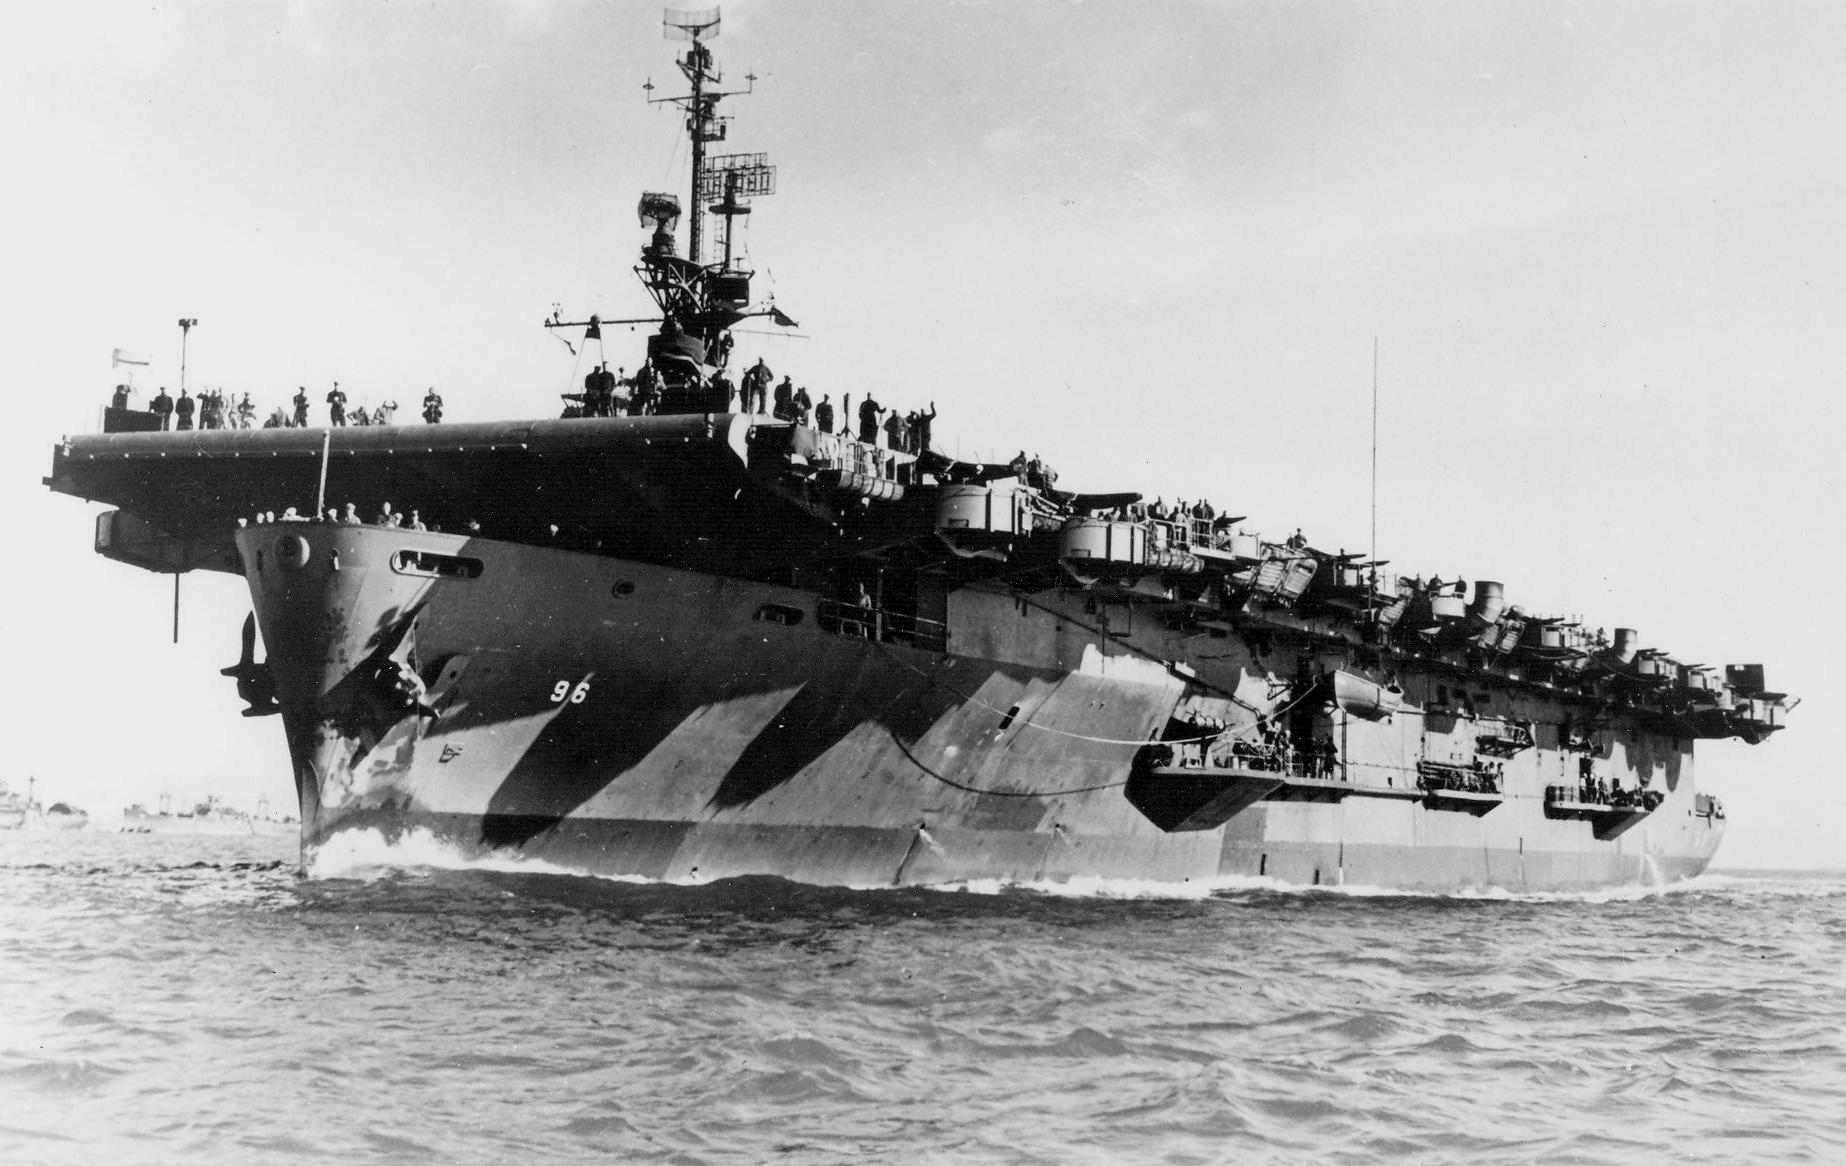 USS_Salamaua_(CVE-96)_underway_off_San_F